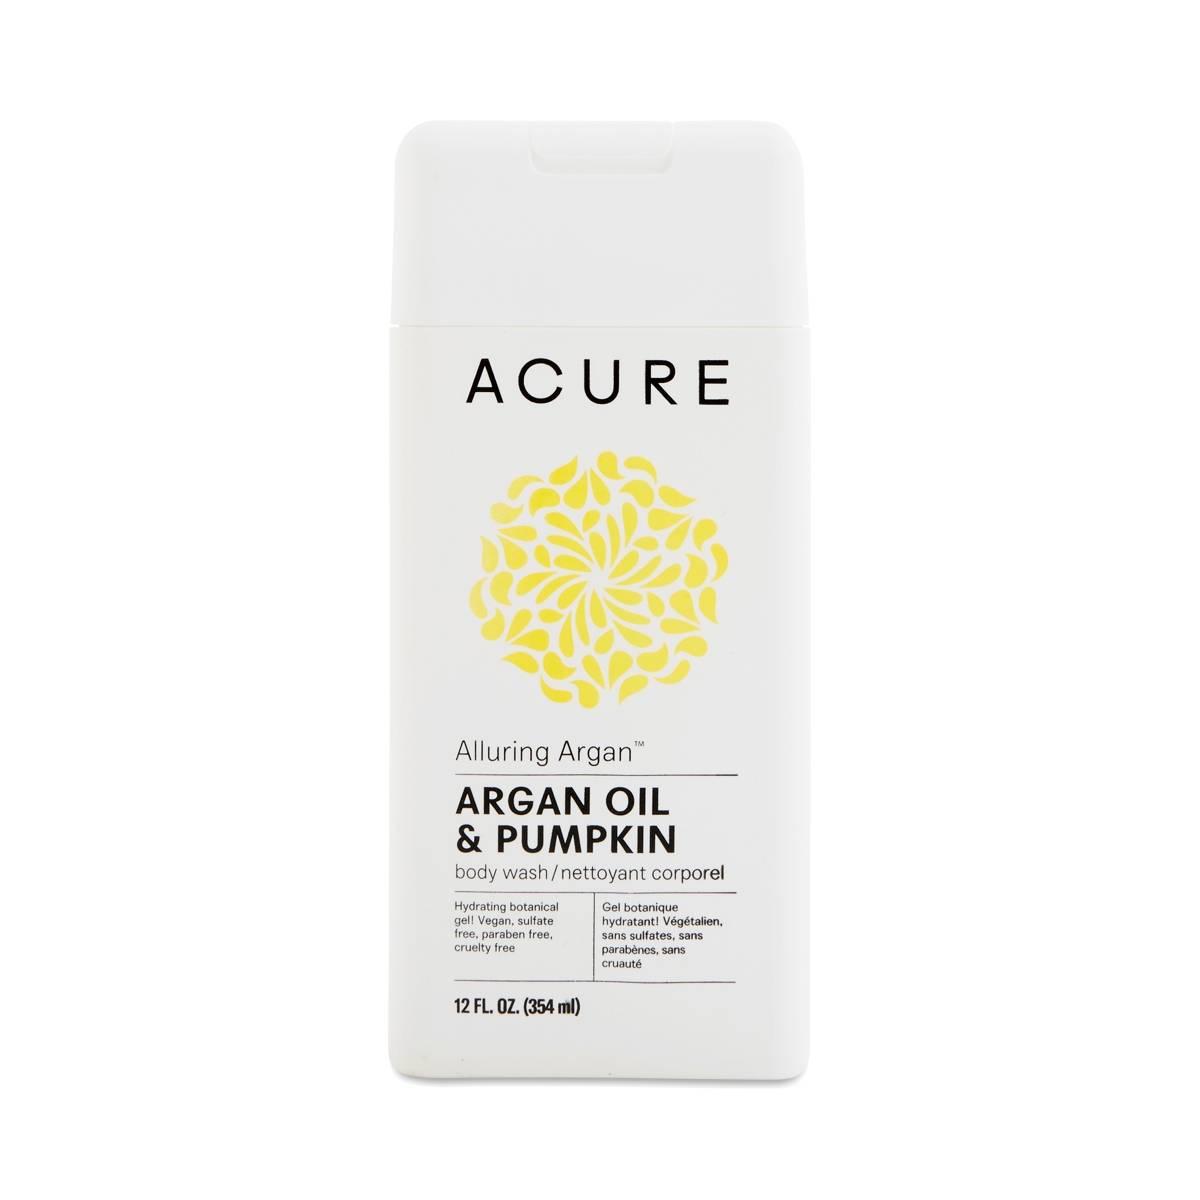 Argan Oil Body Wash By Acure